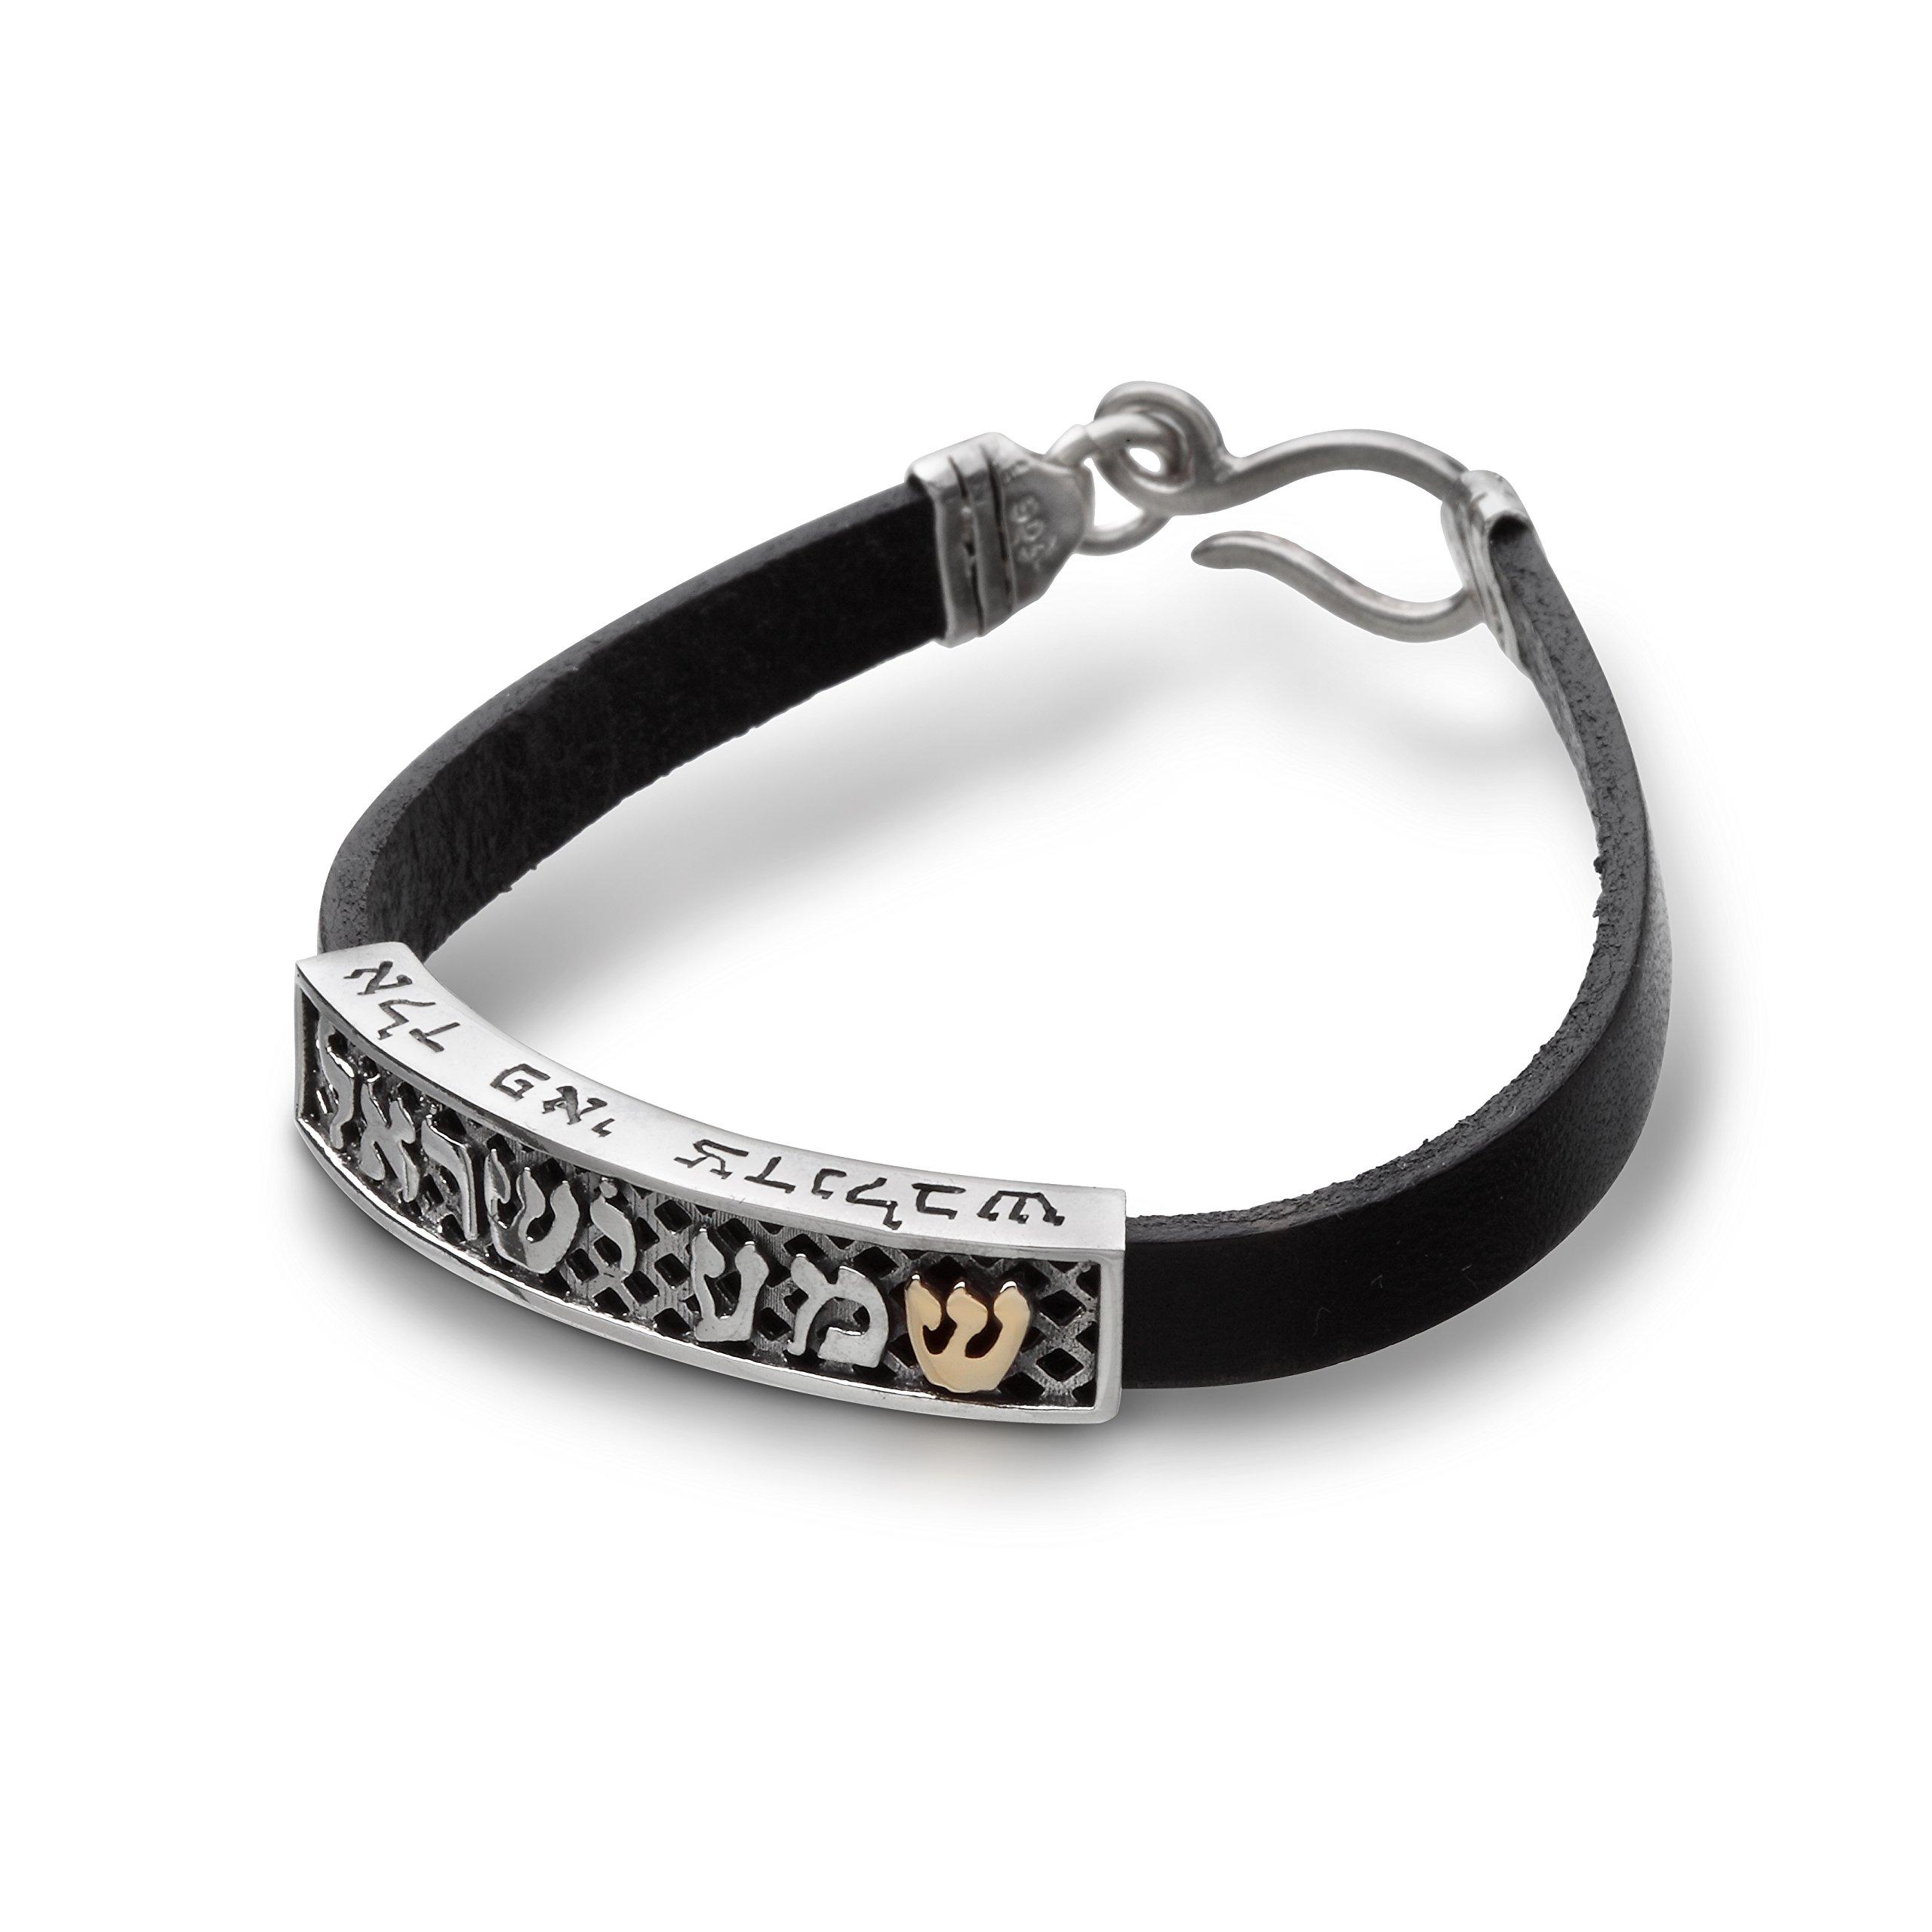 HaAri Kabbalah Shema Yisrael Leather, Two-tone Unisex Bracelet (8.3)